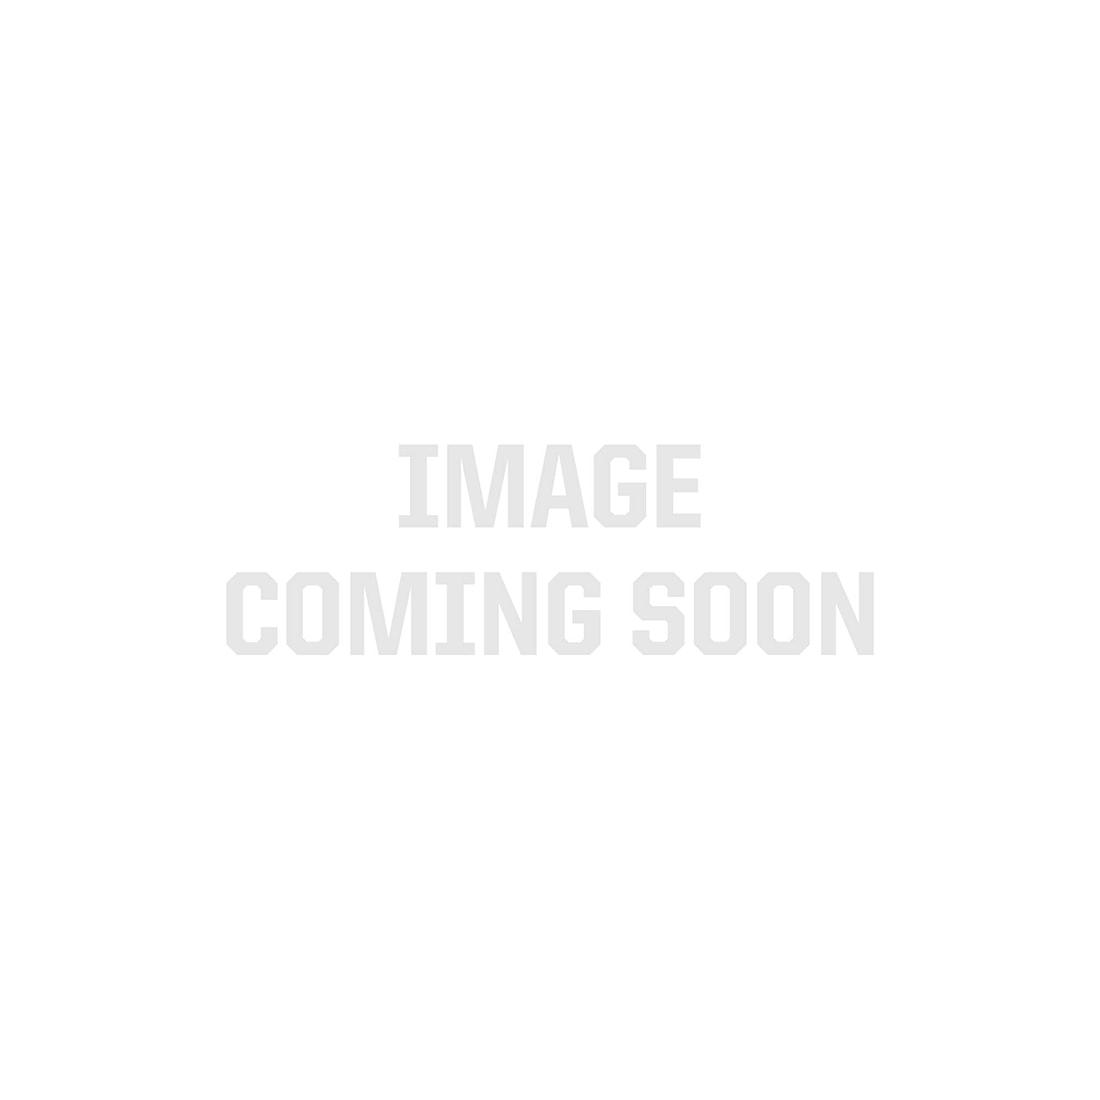 TruColor 2835 CurrentControl LED Strip Light - 2,700K - 160/m - CurrentControl - 1 Foot